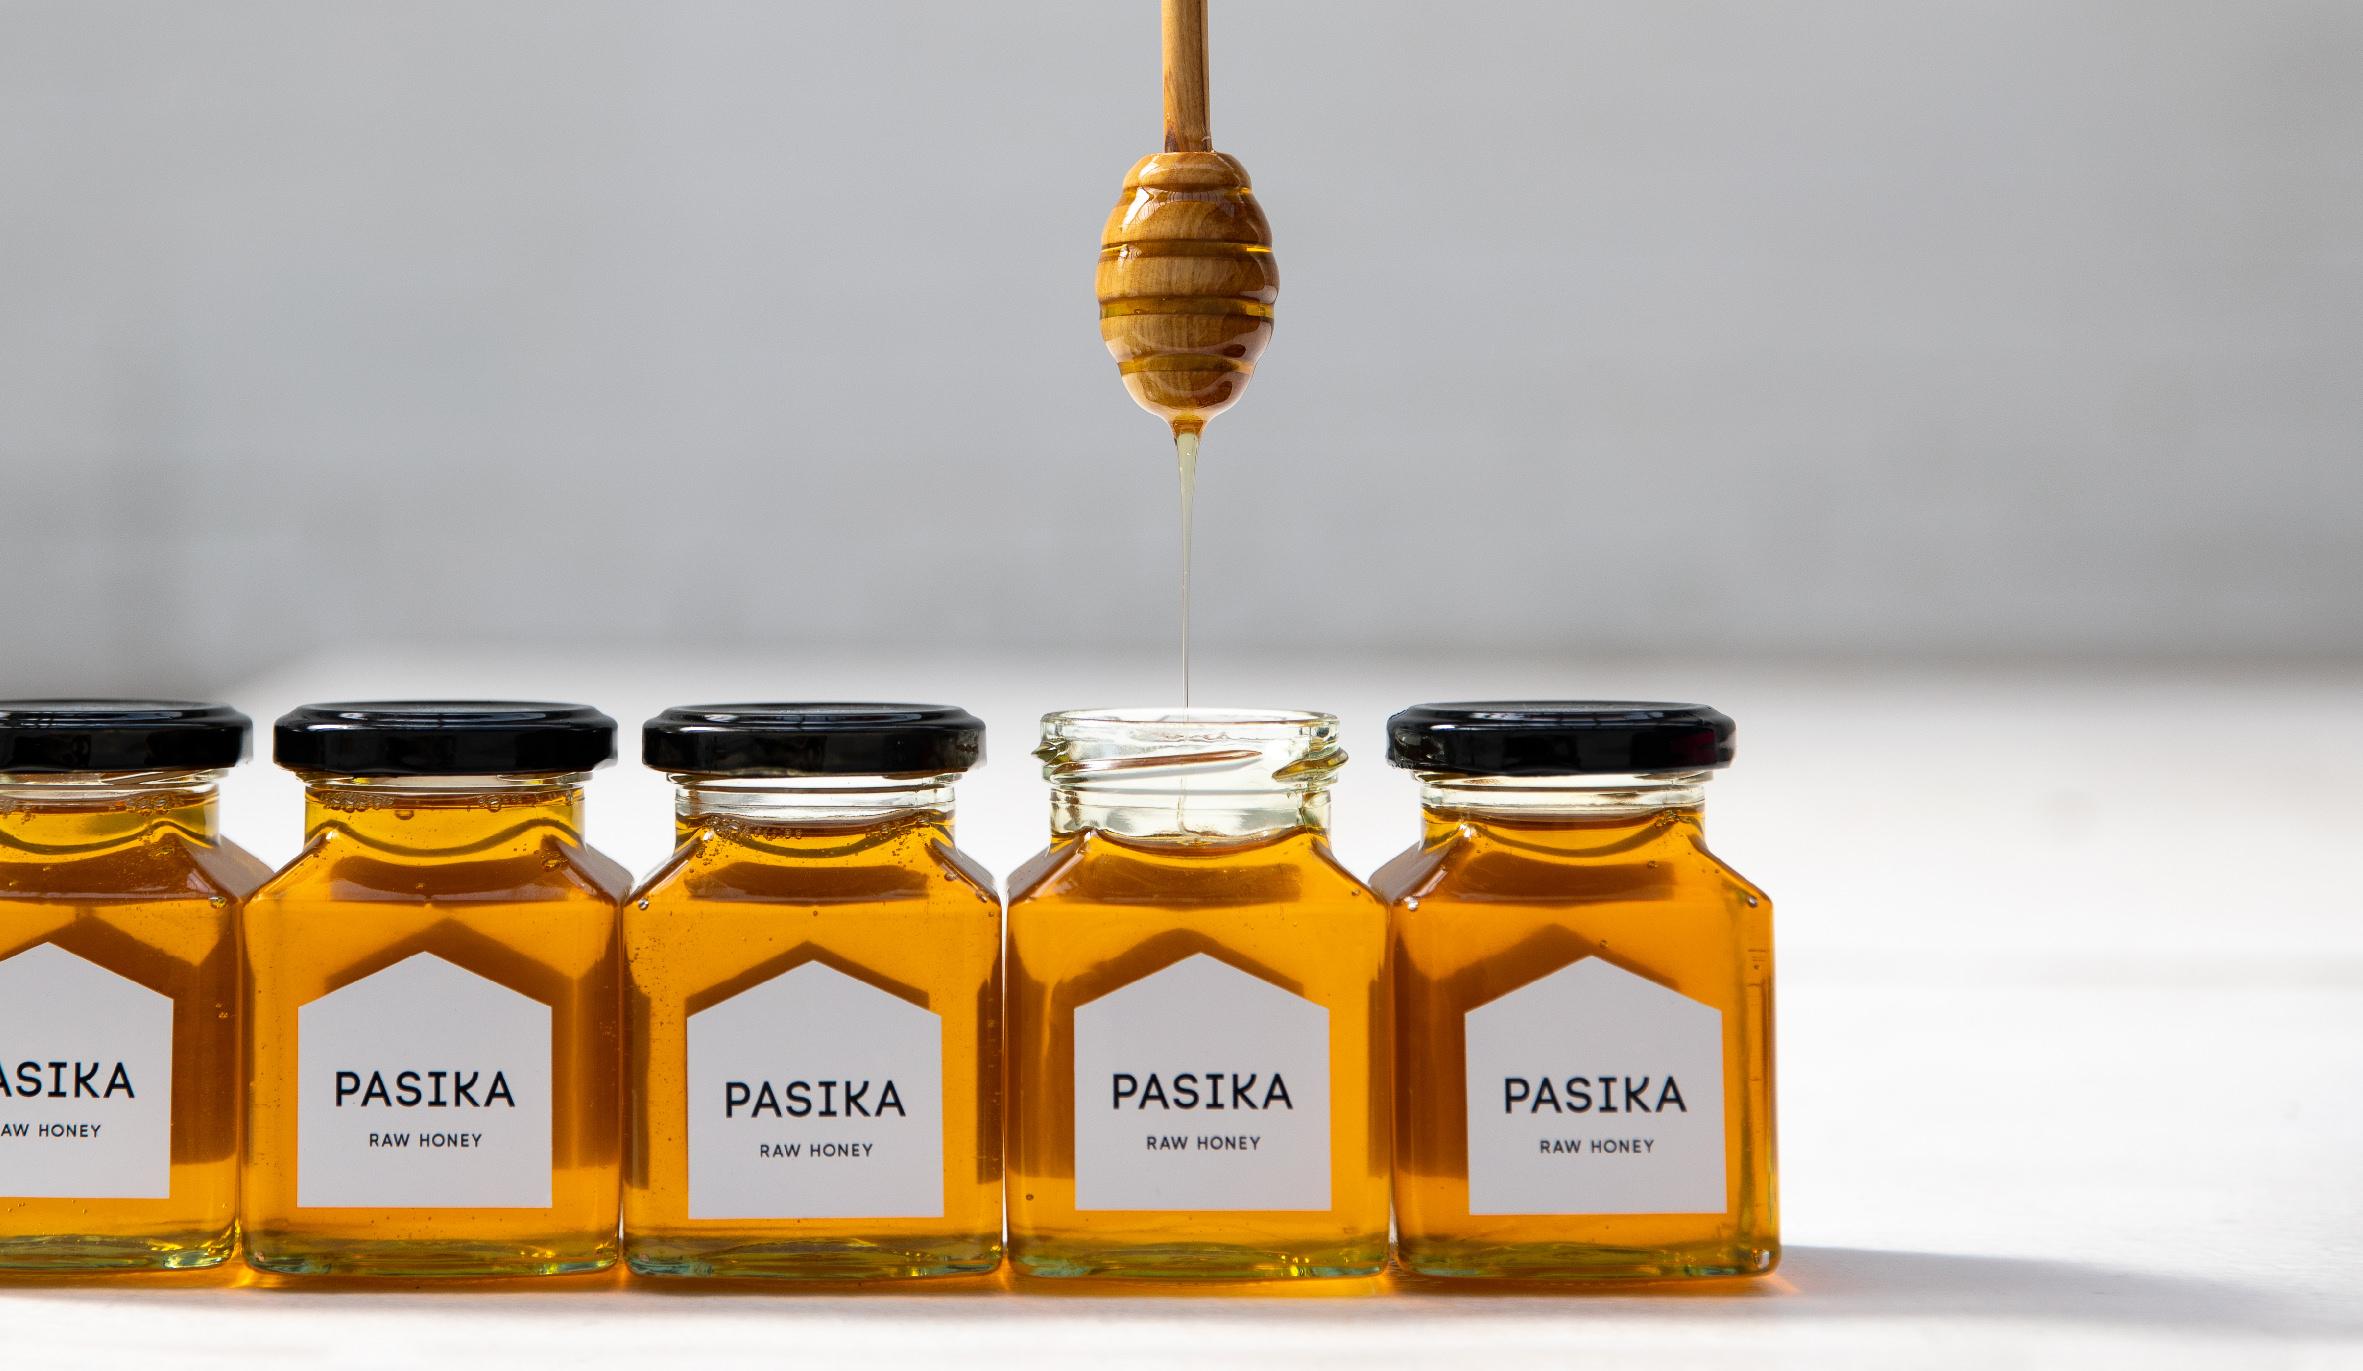 pasika jar honey packaging